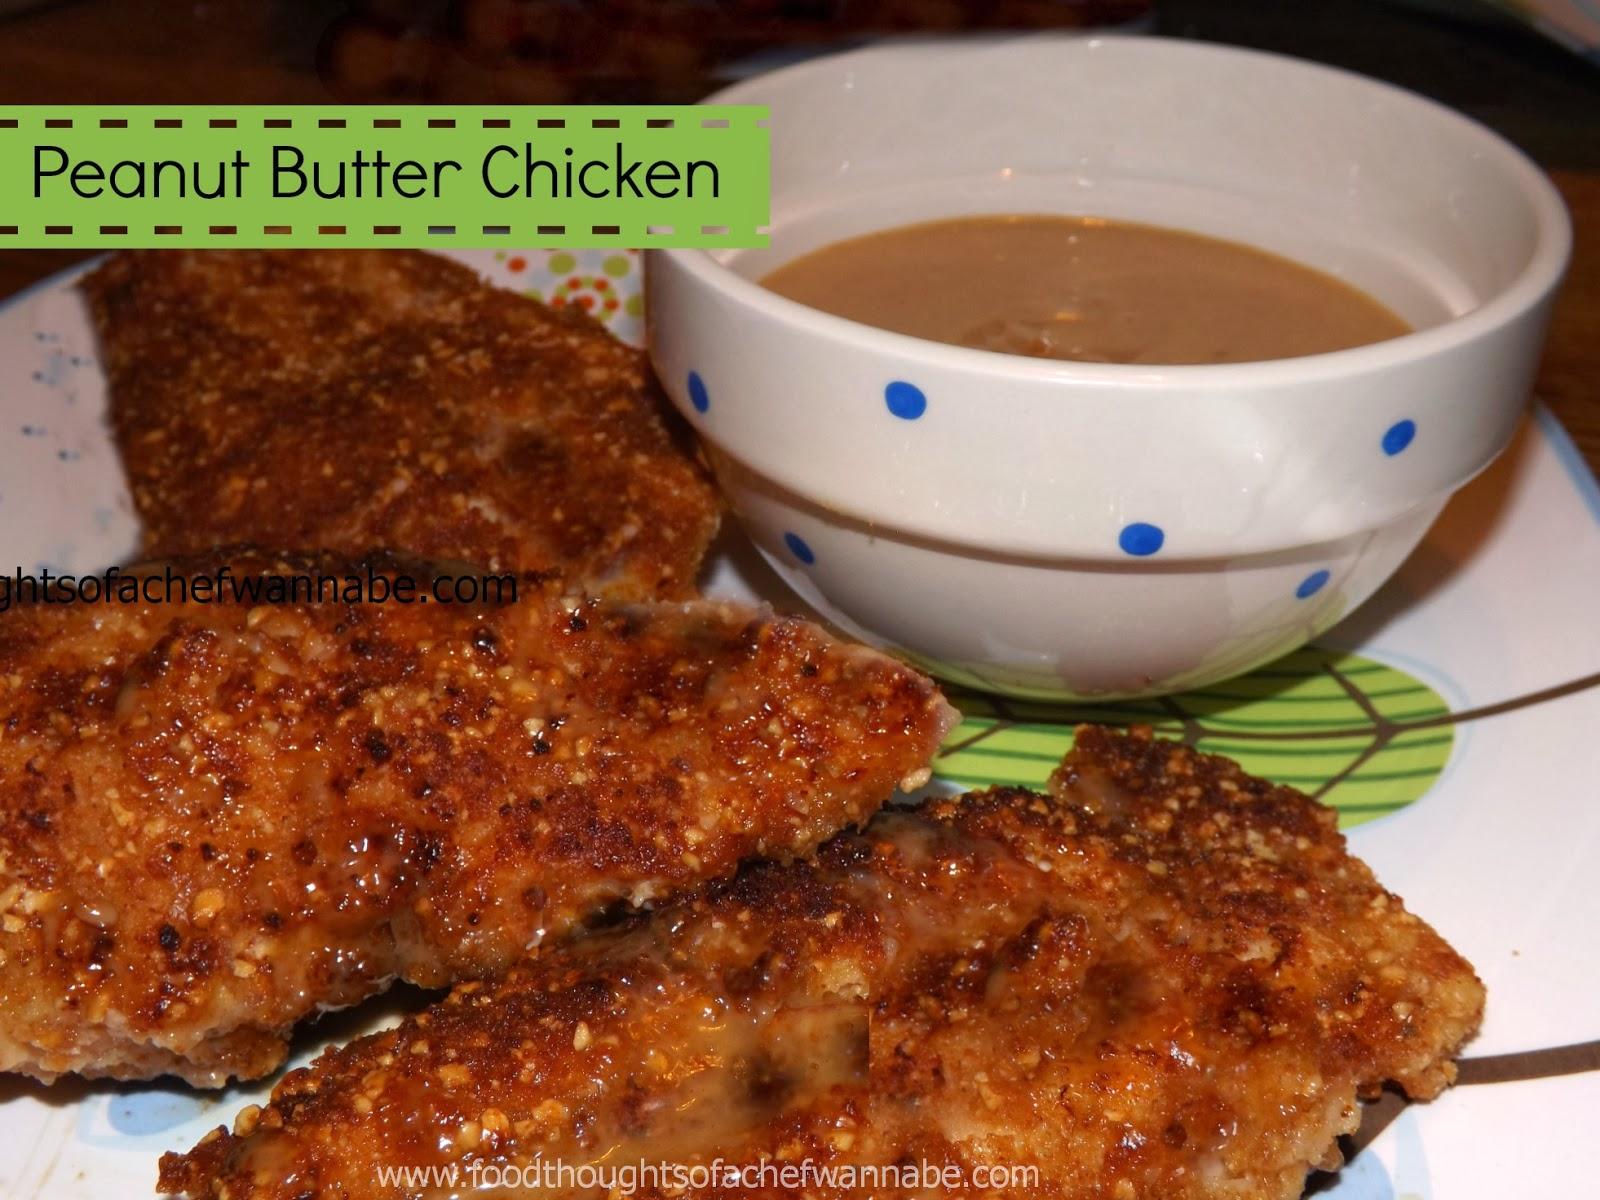 Foodthoughtsofachefwannabe Peanut Butter Chicken